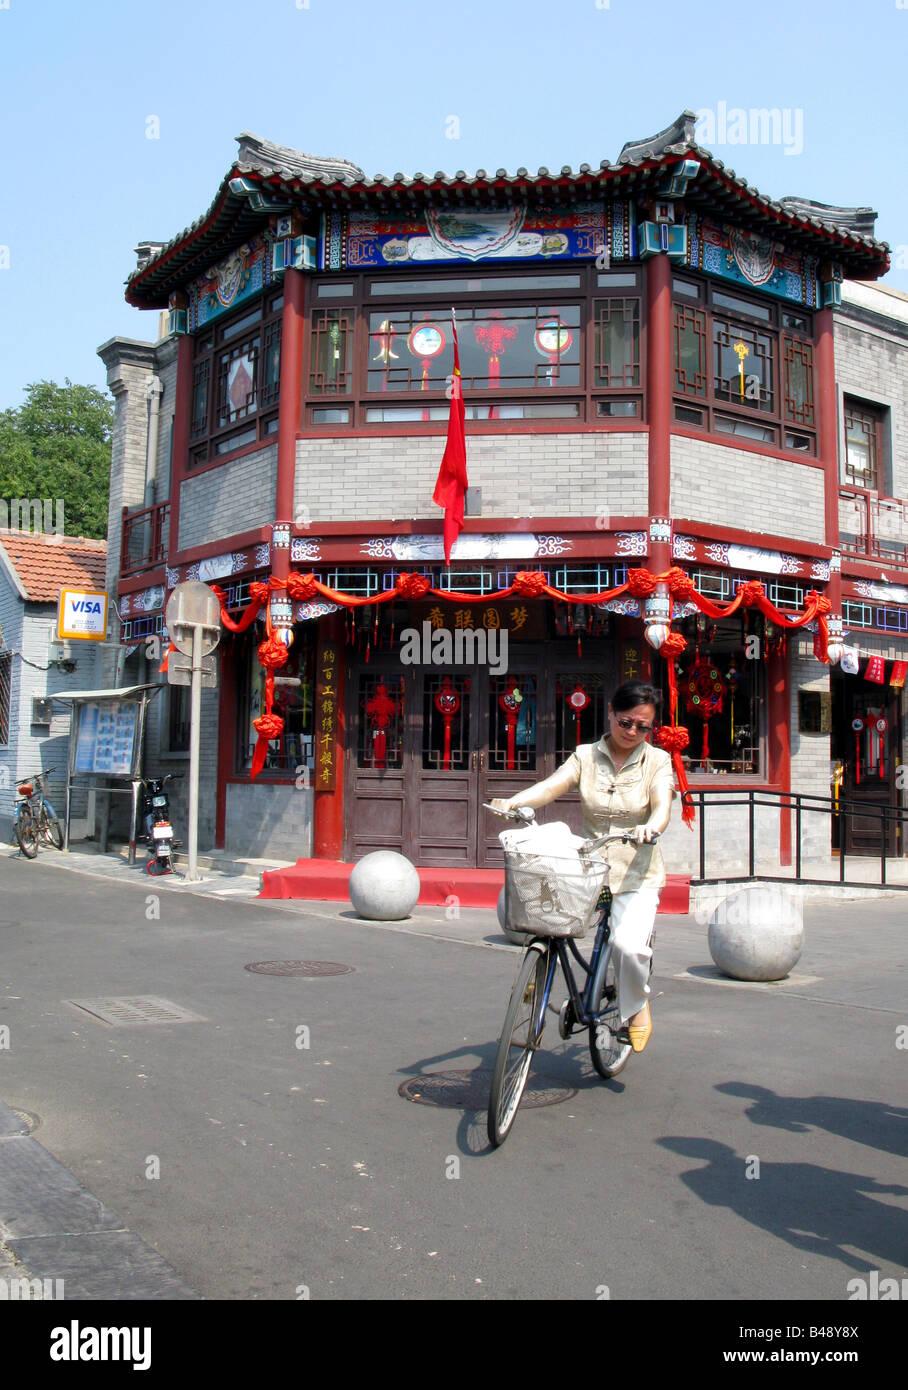 A women on a bike near Yinding bridge and Yandai Byway near Lake Qianhai and lake Houhai in the Shichahai district - Stock Image